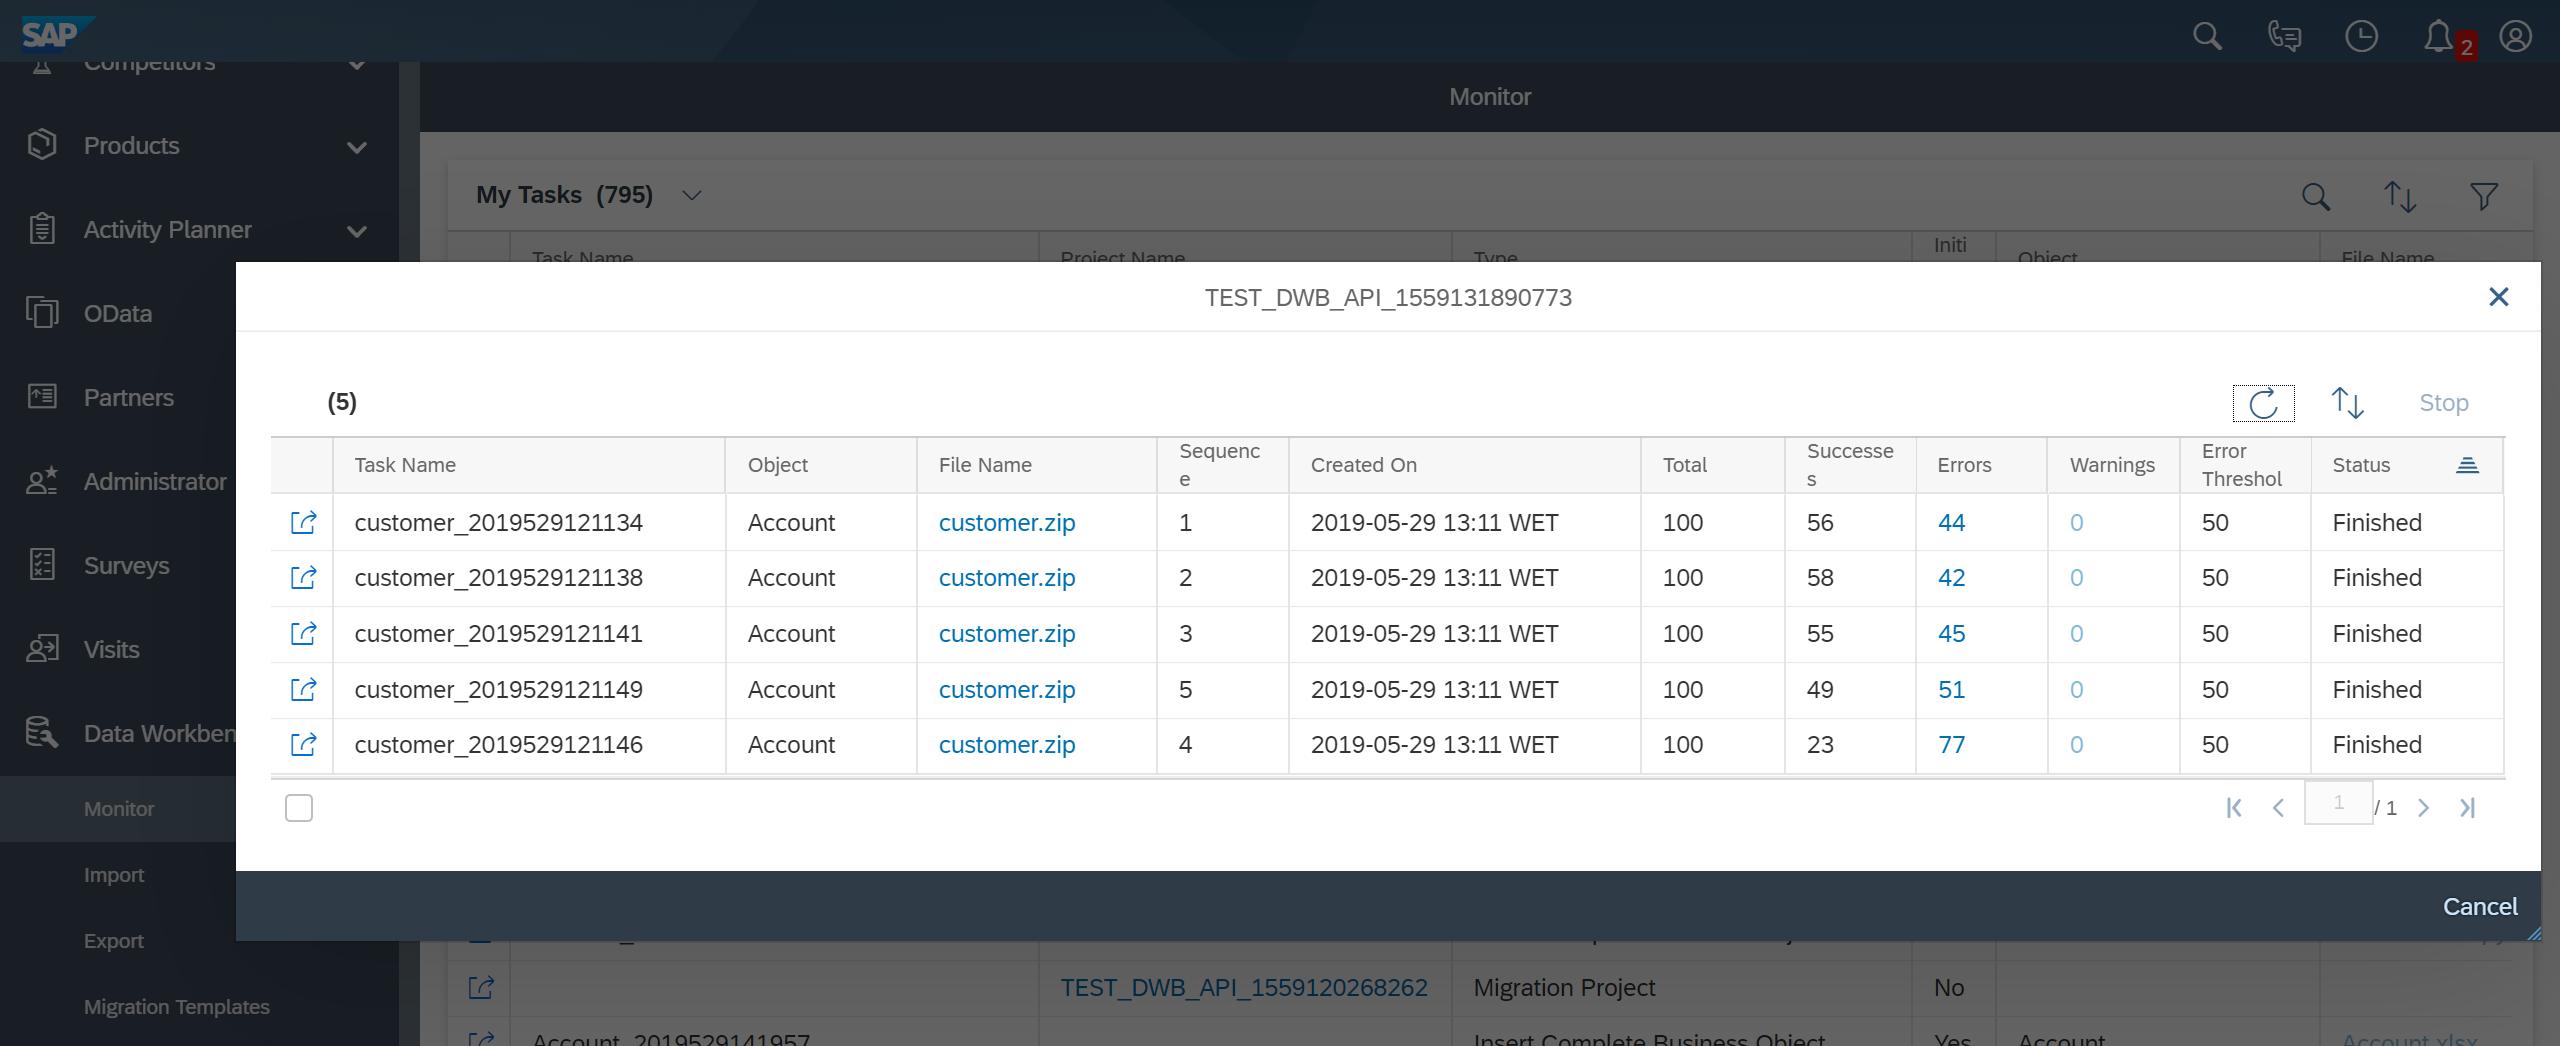 Consuming SAP Cloud for Customer Data Workbench REST API